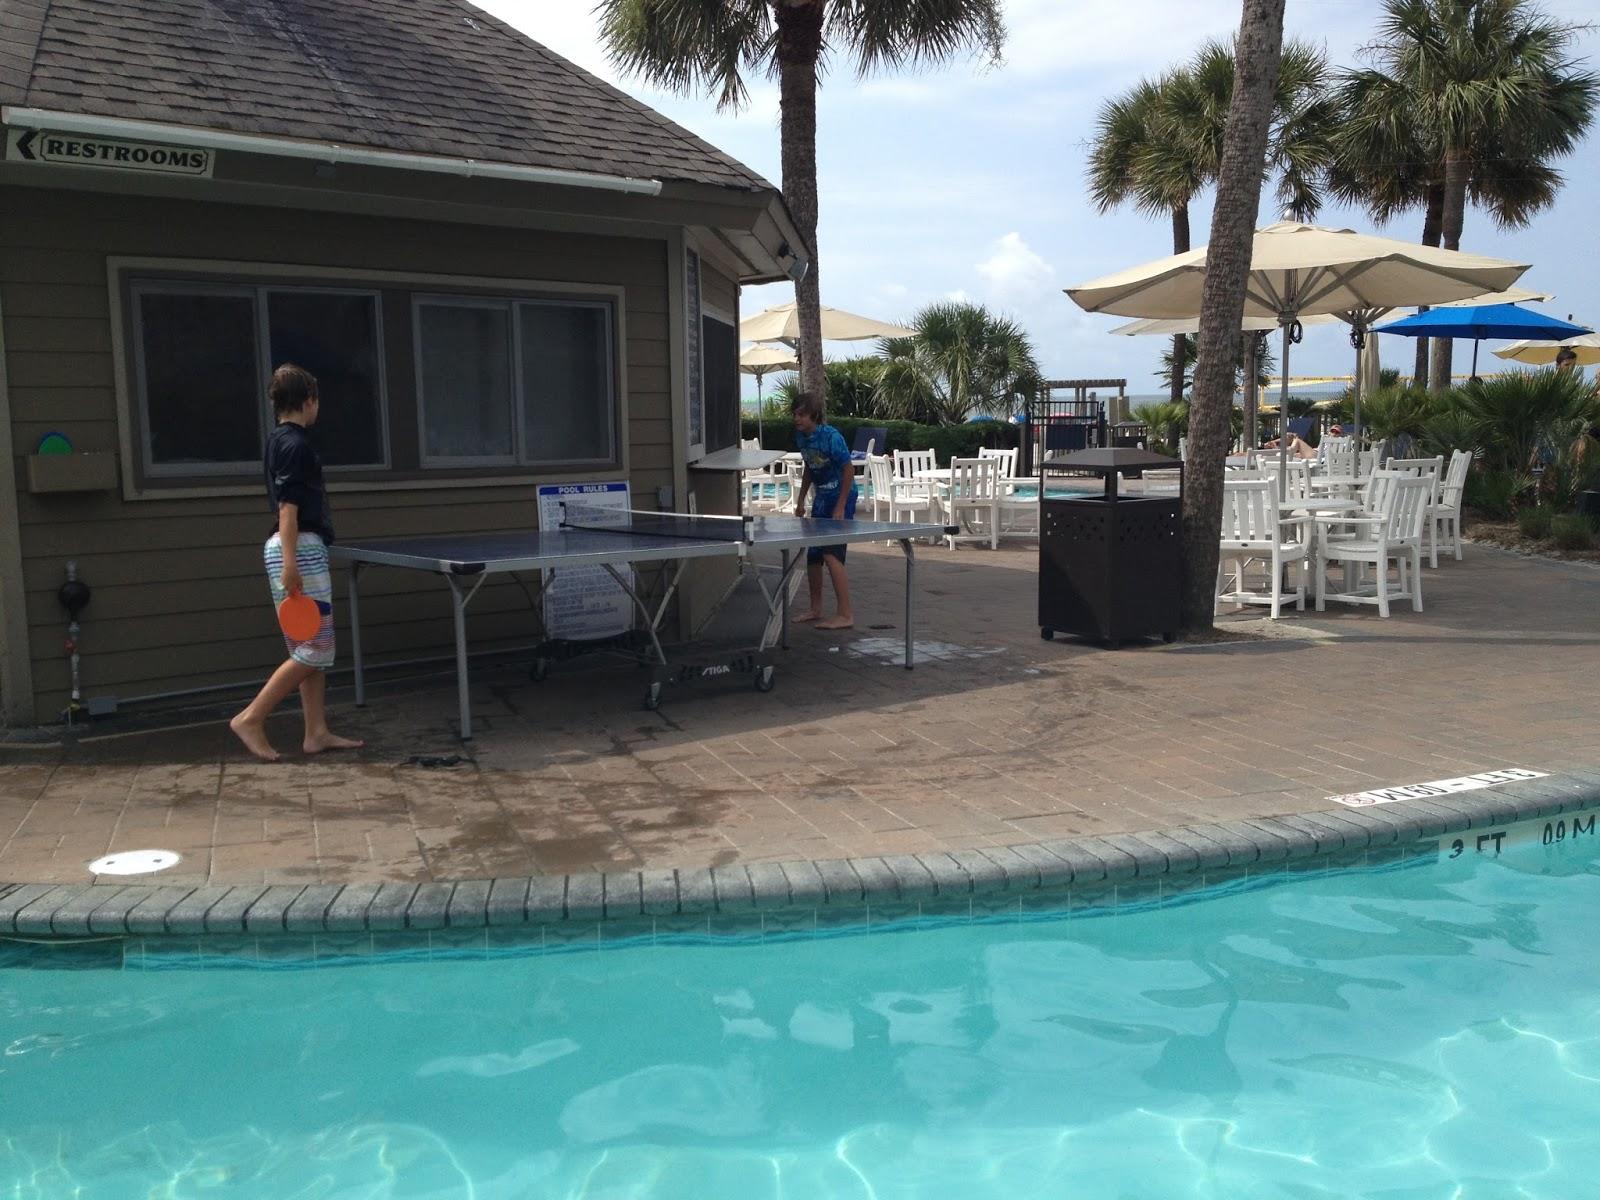 The Beach House A Holiday Inn Resort Hilton Head Island South Carolina Family Travel